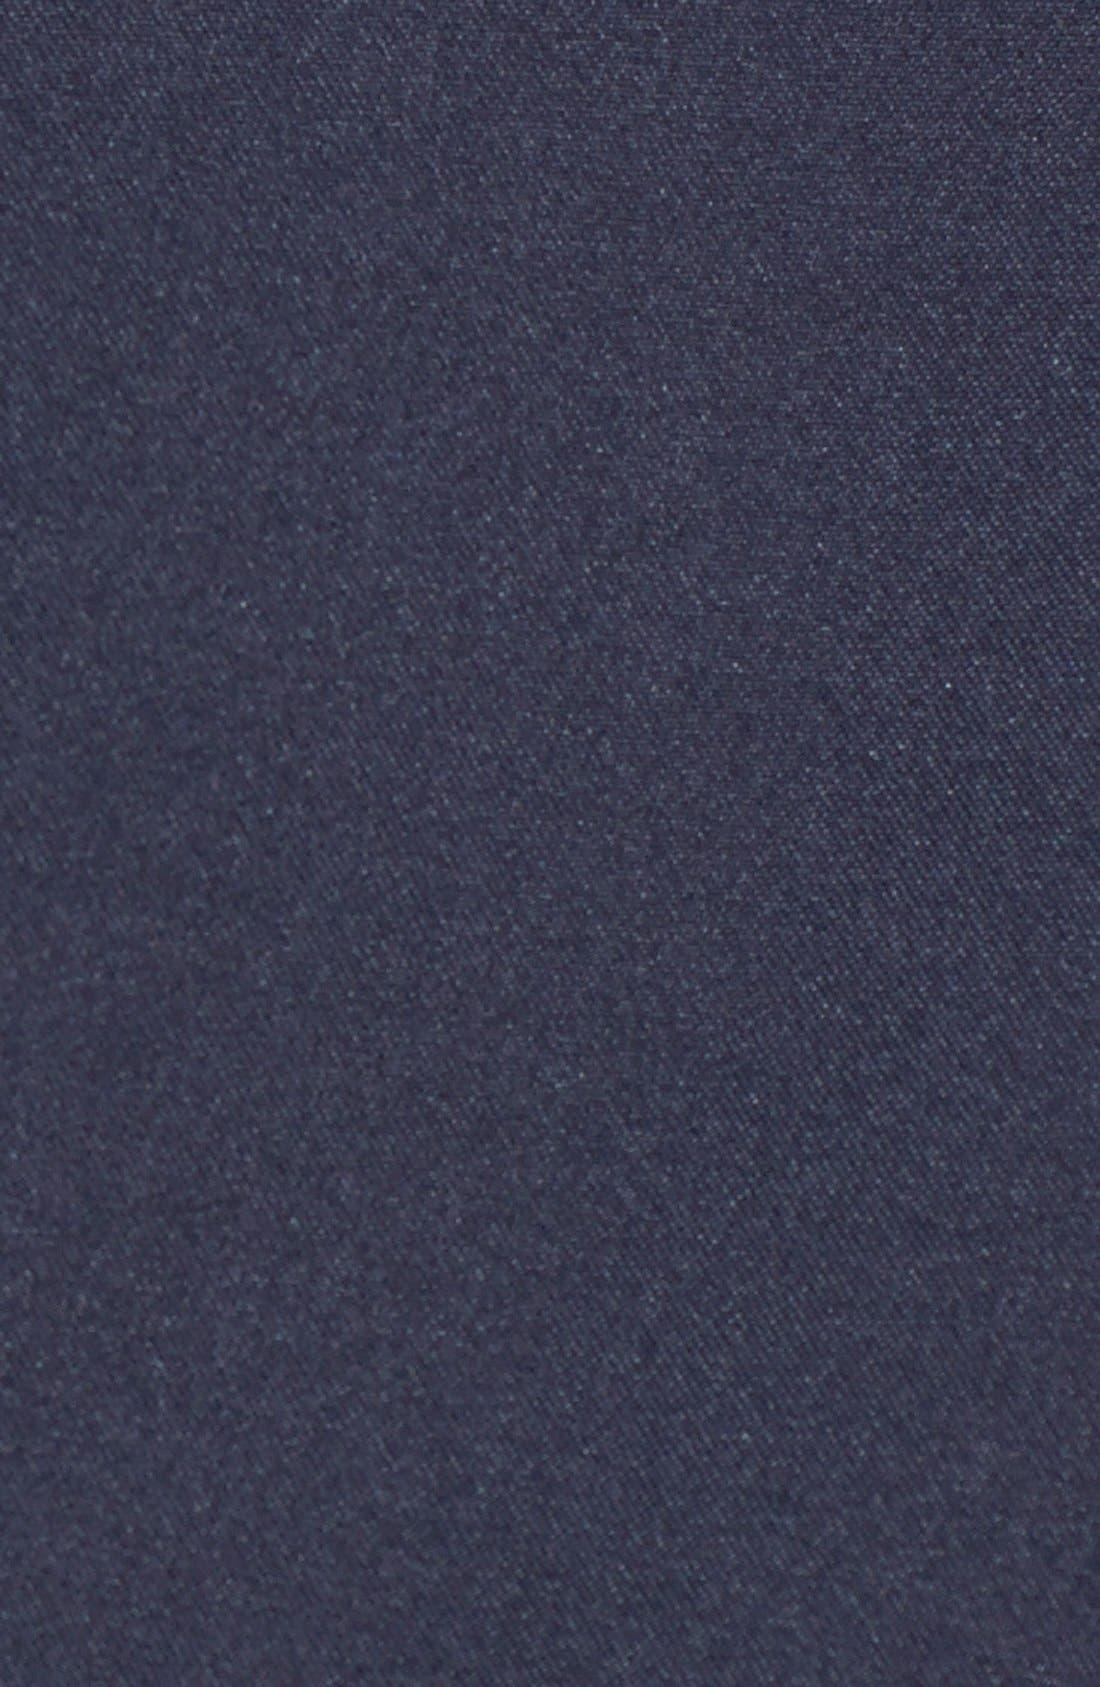 'Chicago Bears - Beacon' WeatherTec Wind & Water Resistant Jacket,                             Alternate thumbnail 3, color,                             410